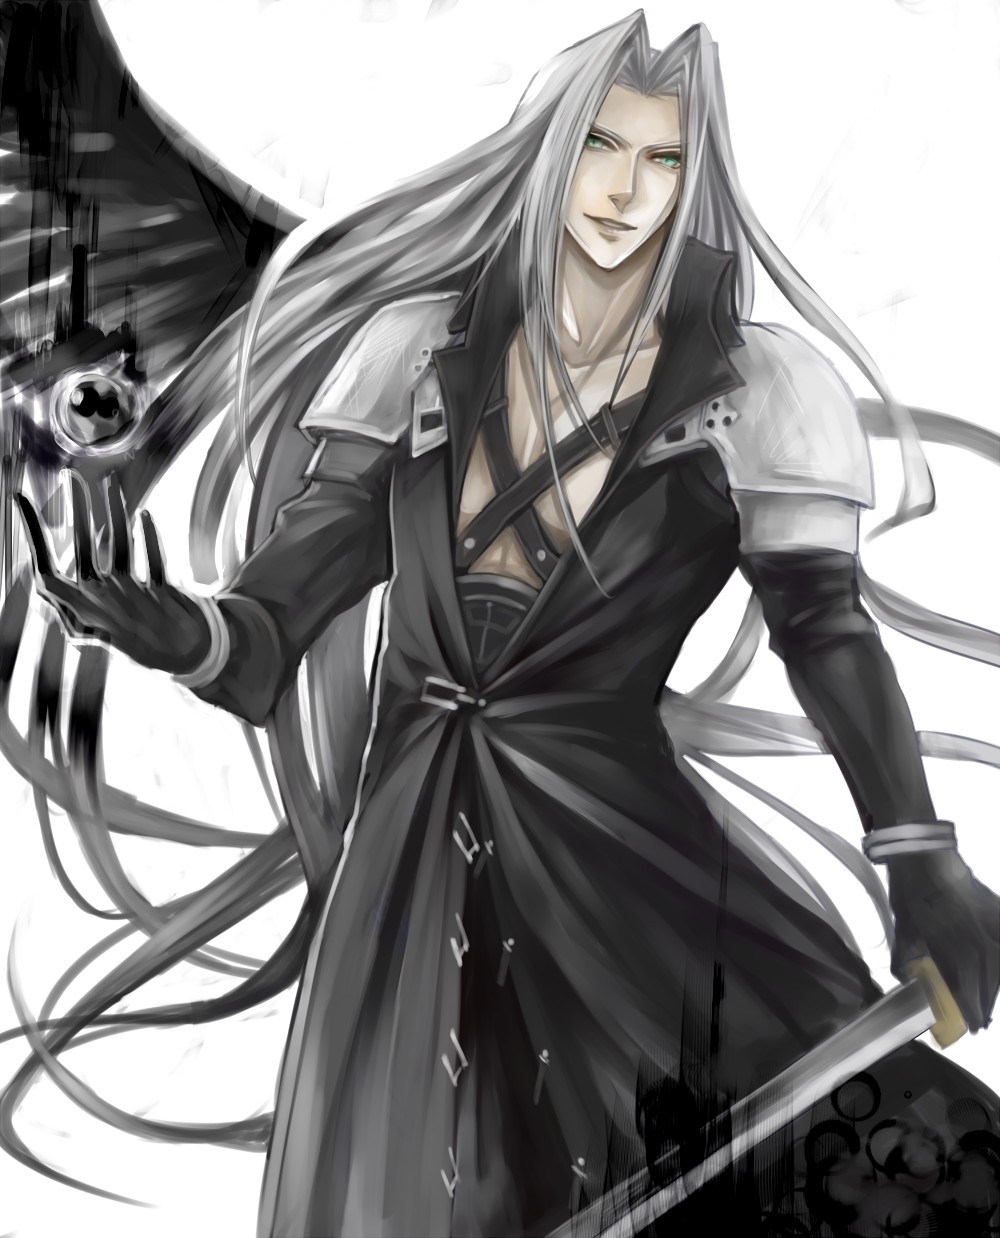 Sephiroth Final Fantasy Vii Image 978013 Zerochan